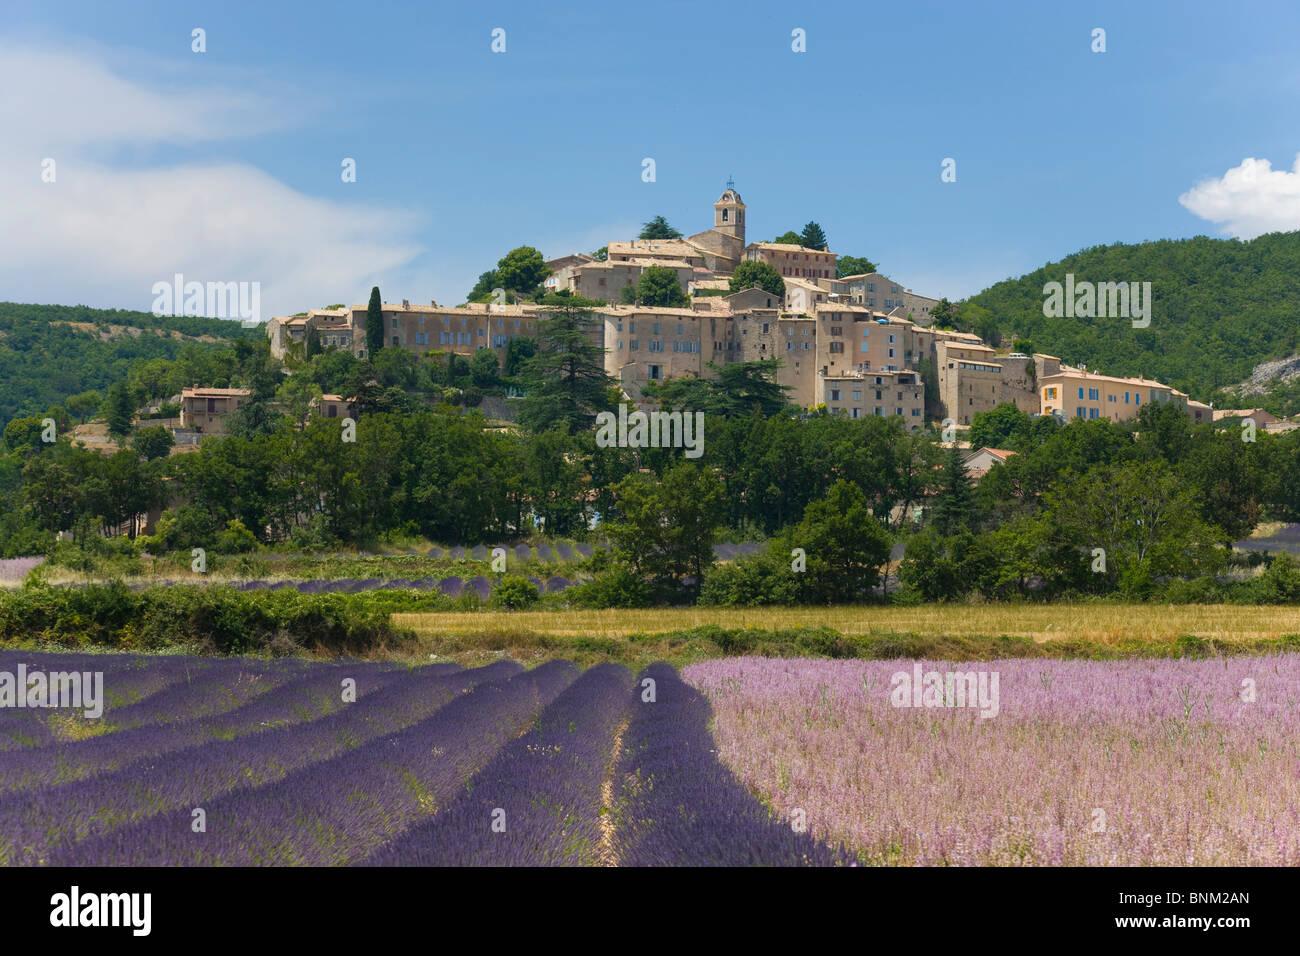 Almond Ville France